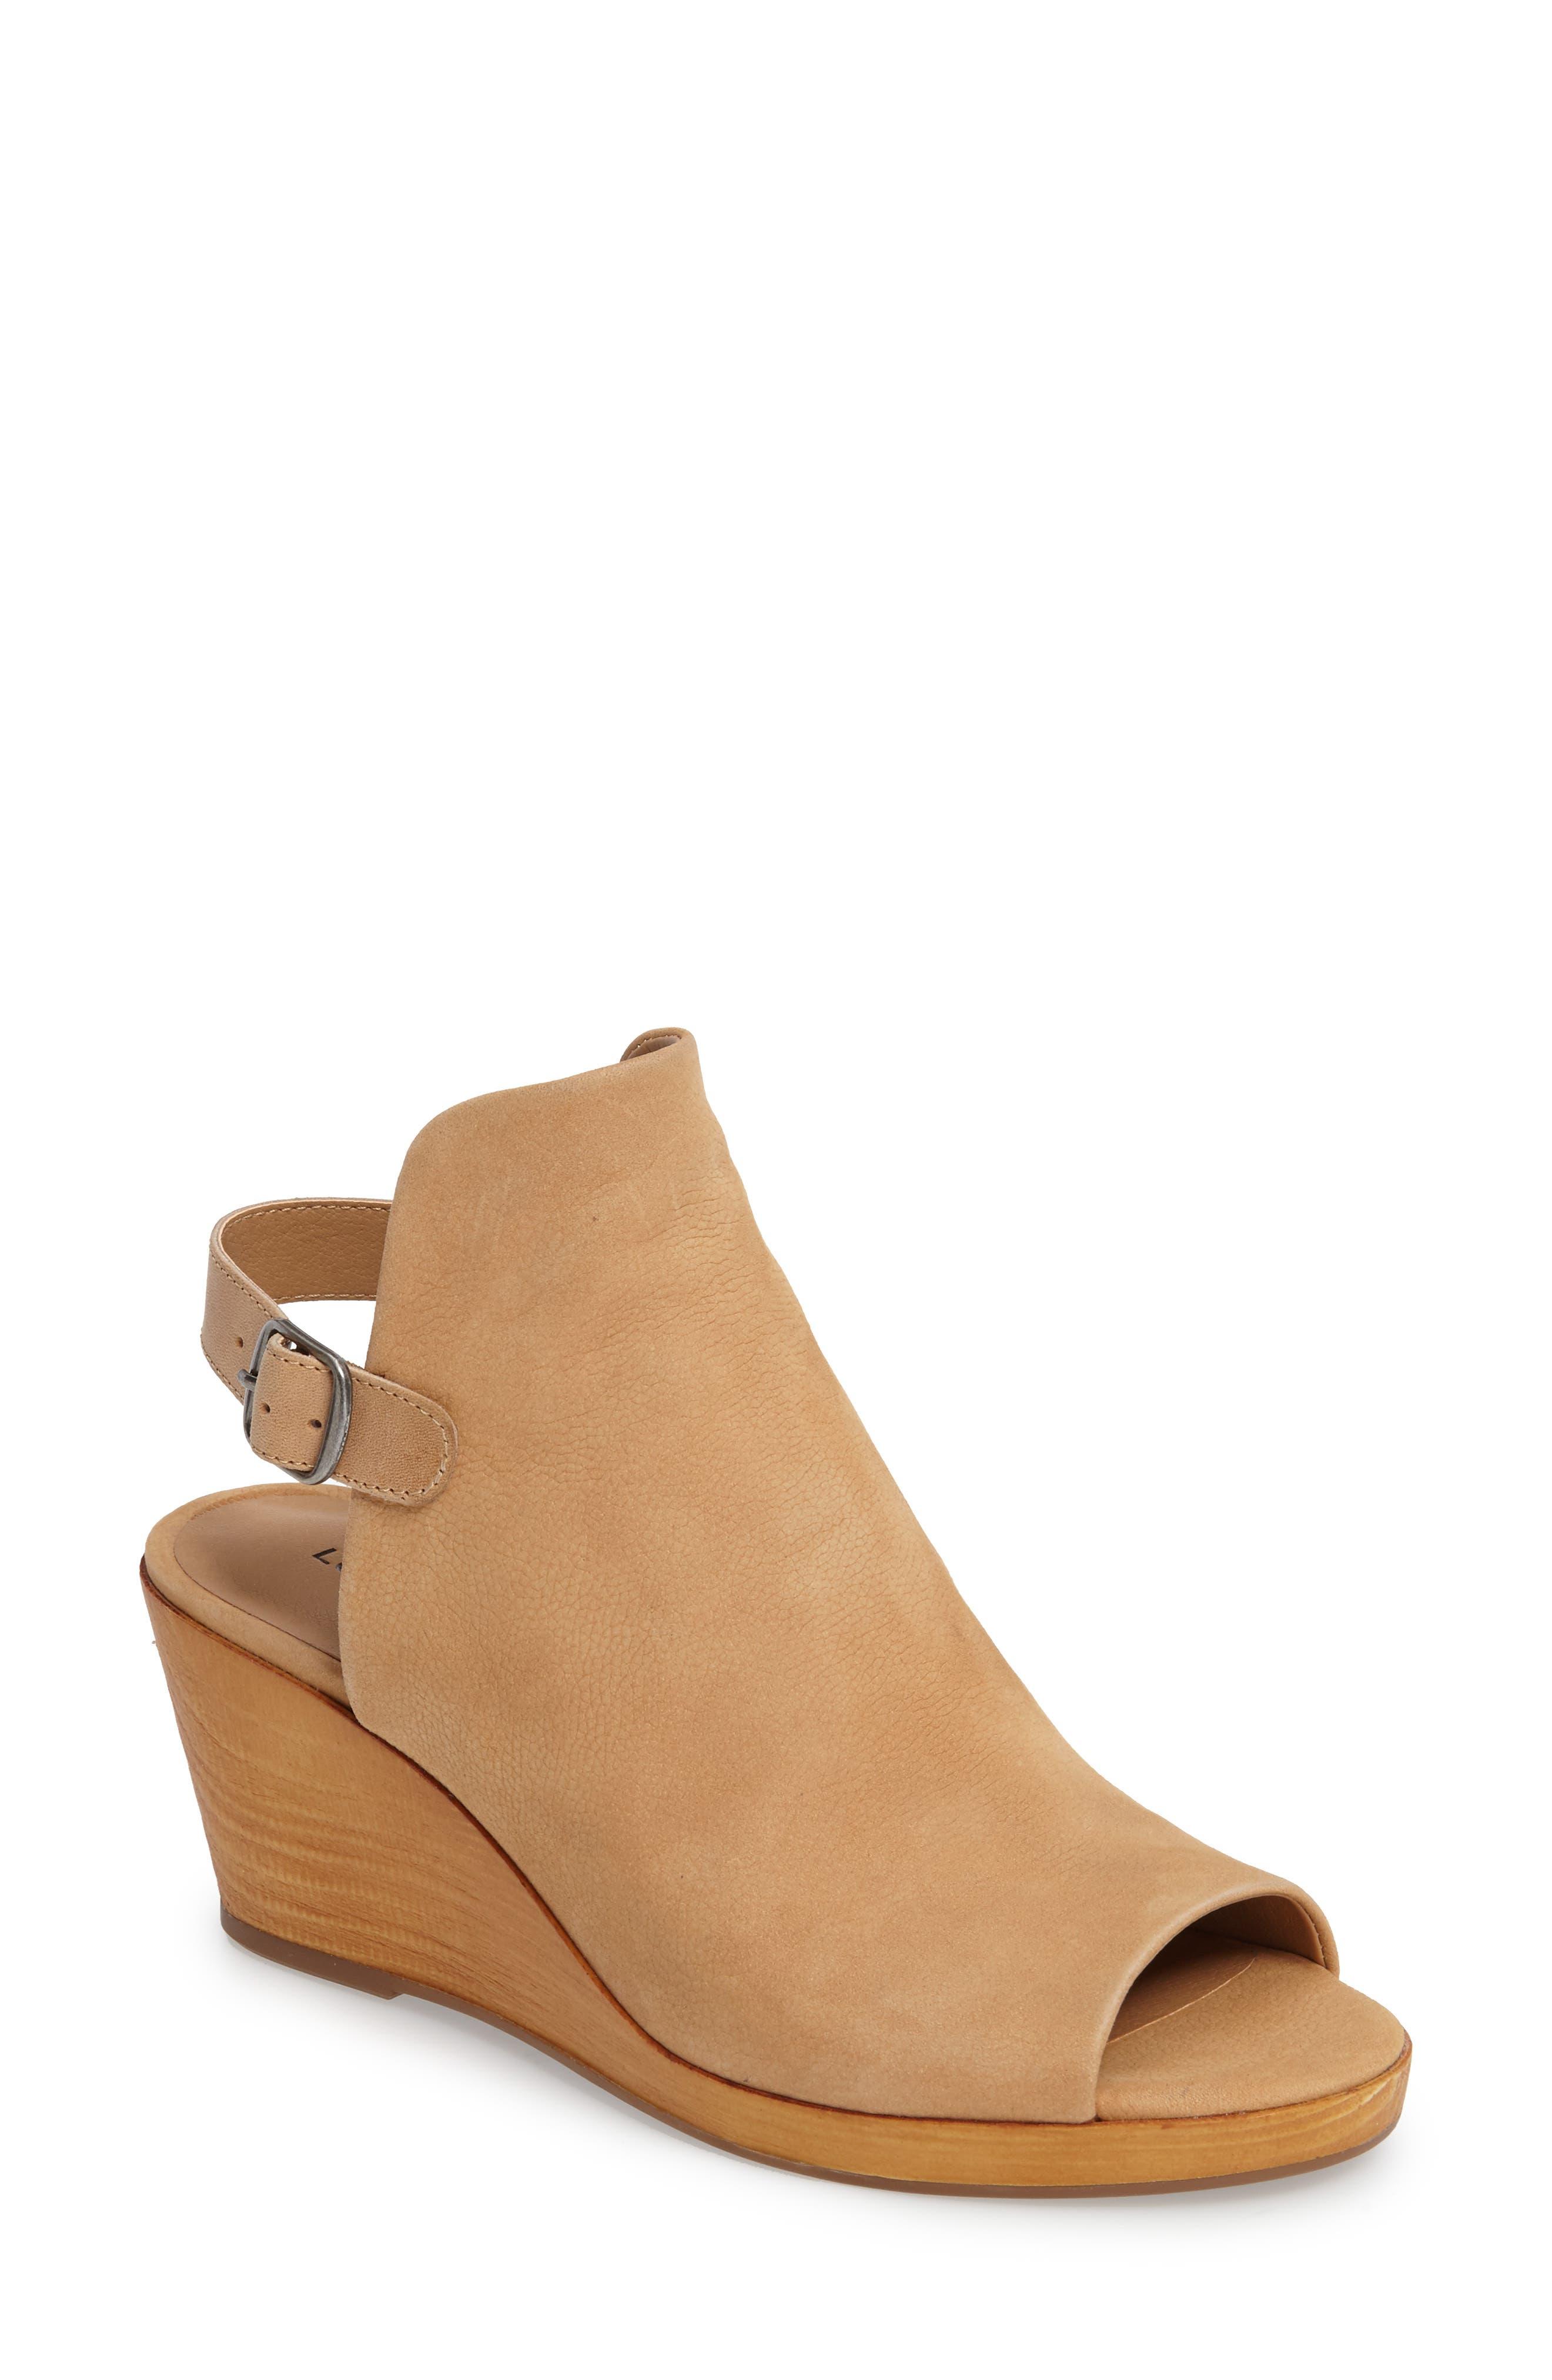 Alternate Image 1 Selected - Lucky Brand Keralin Wedge Sandal (Women)